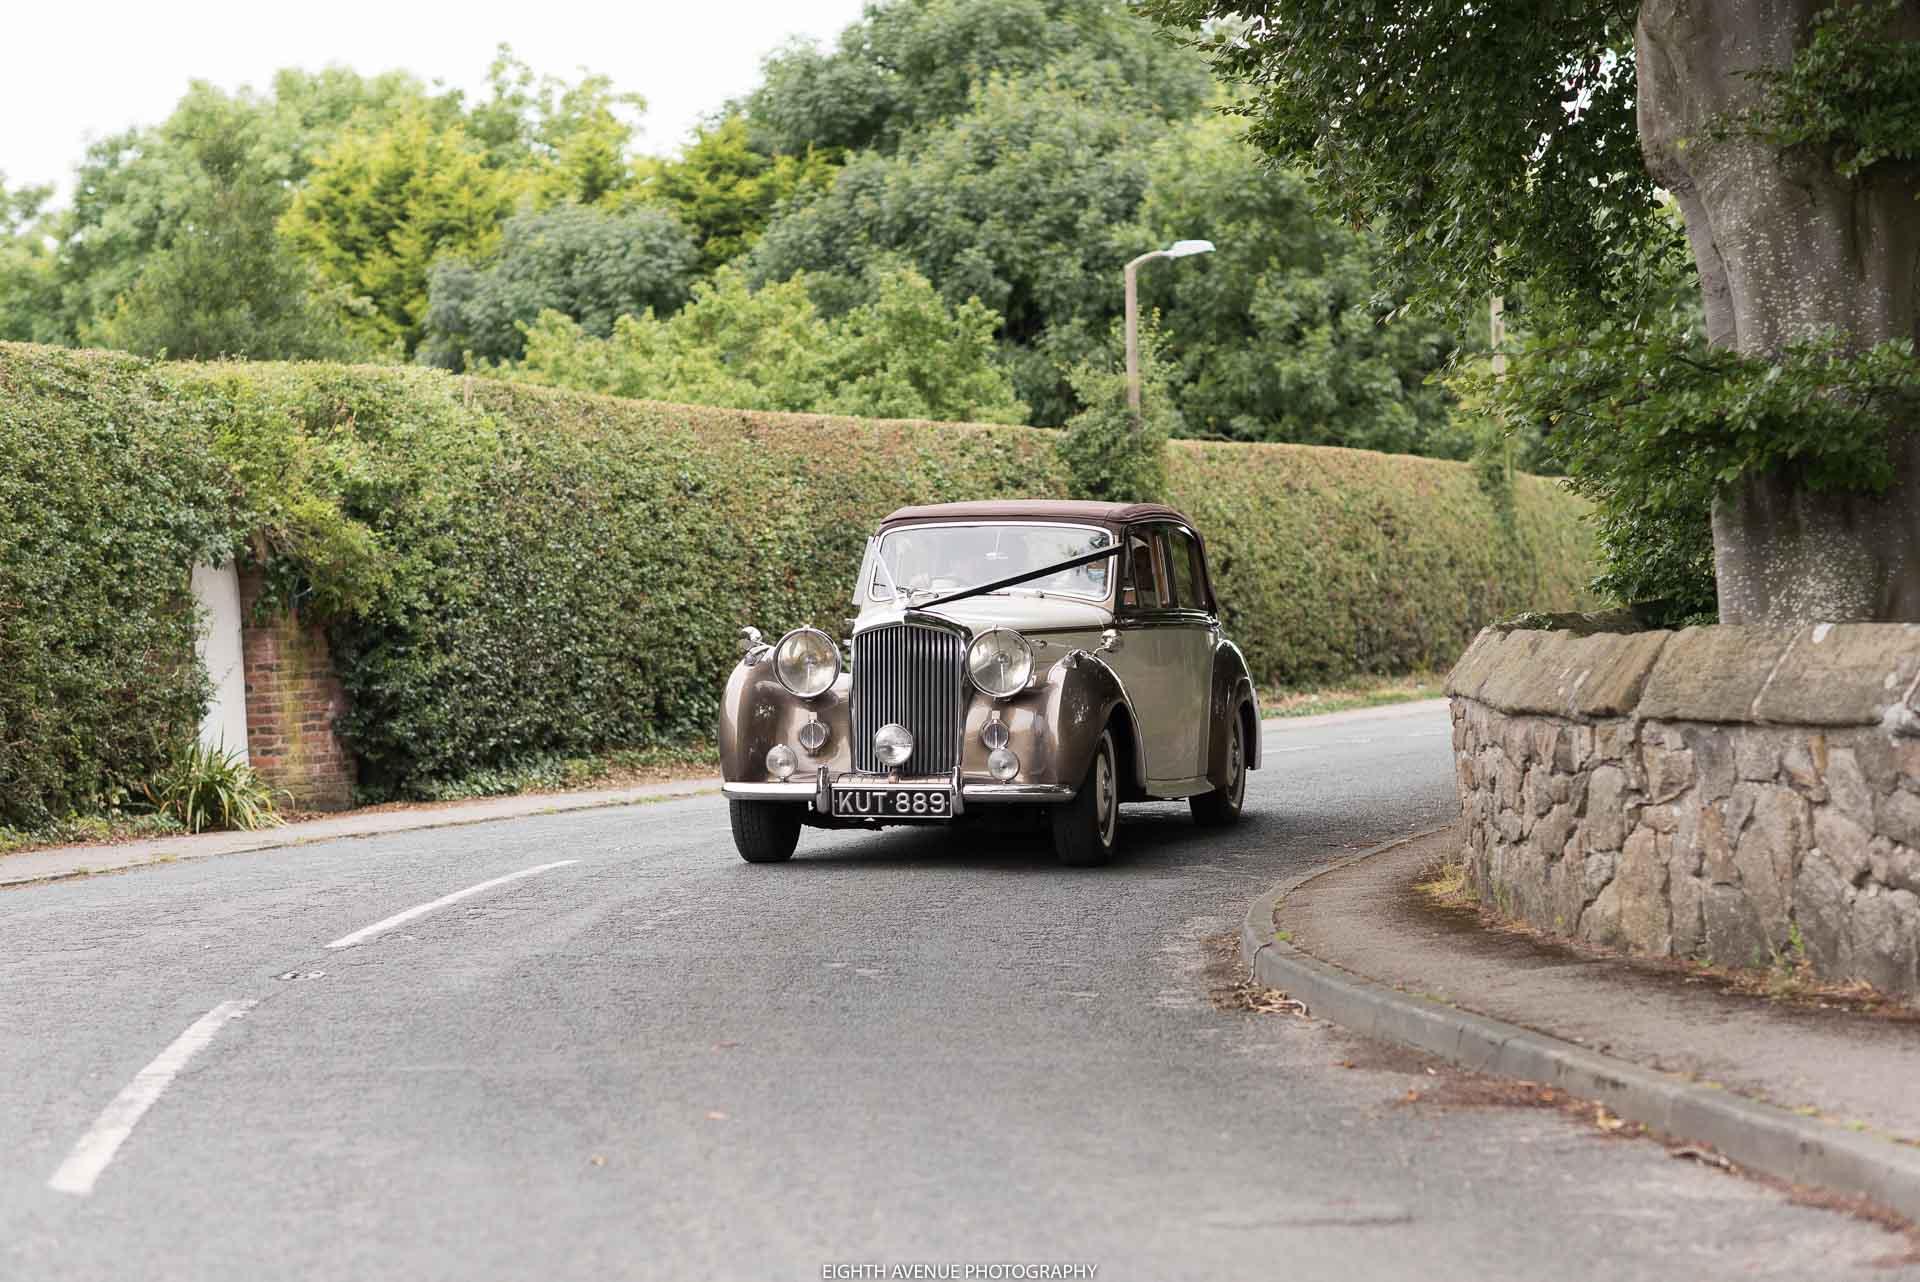 Wedding car arriving at church